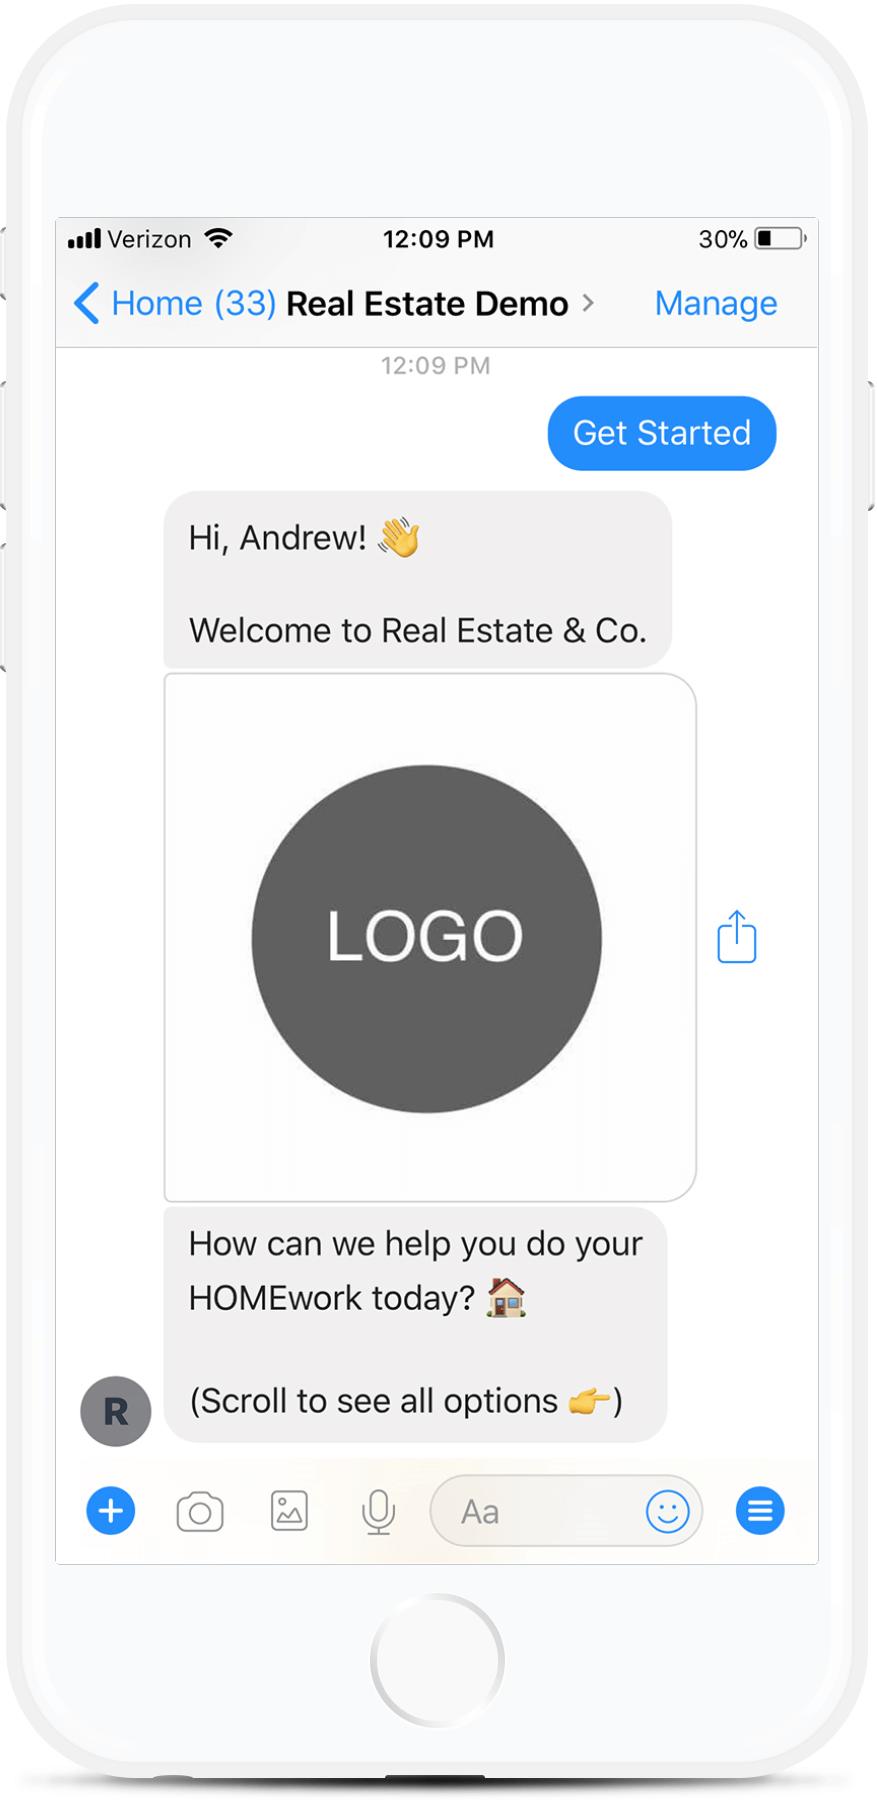 Messenger Chatbot for Real Estate Agents for $69   #messenger #bottemplates #bots #chatbots #aibots #fbmessenger #botmakers